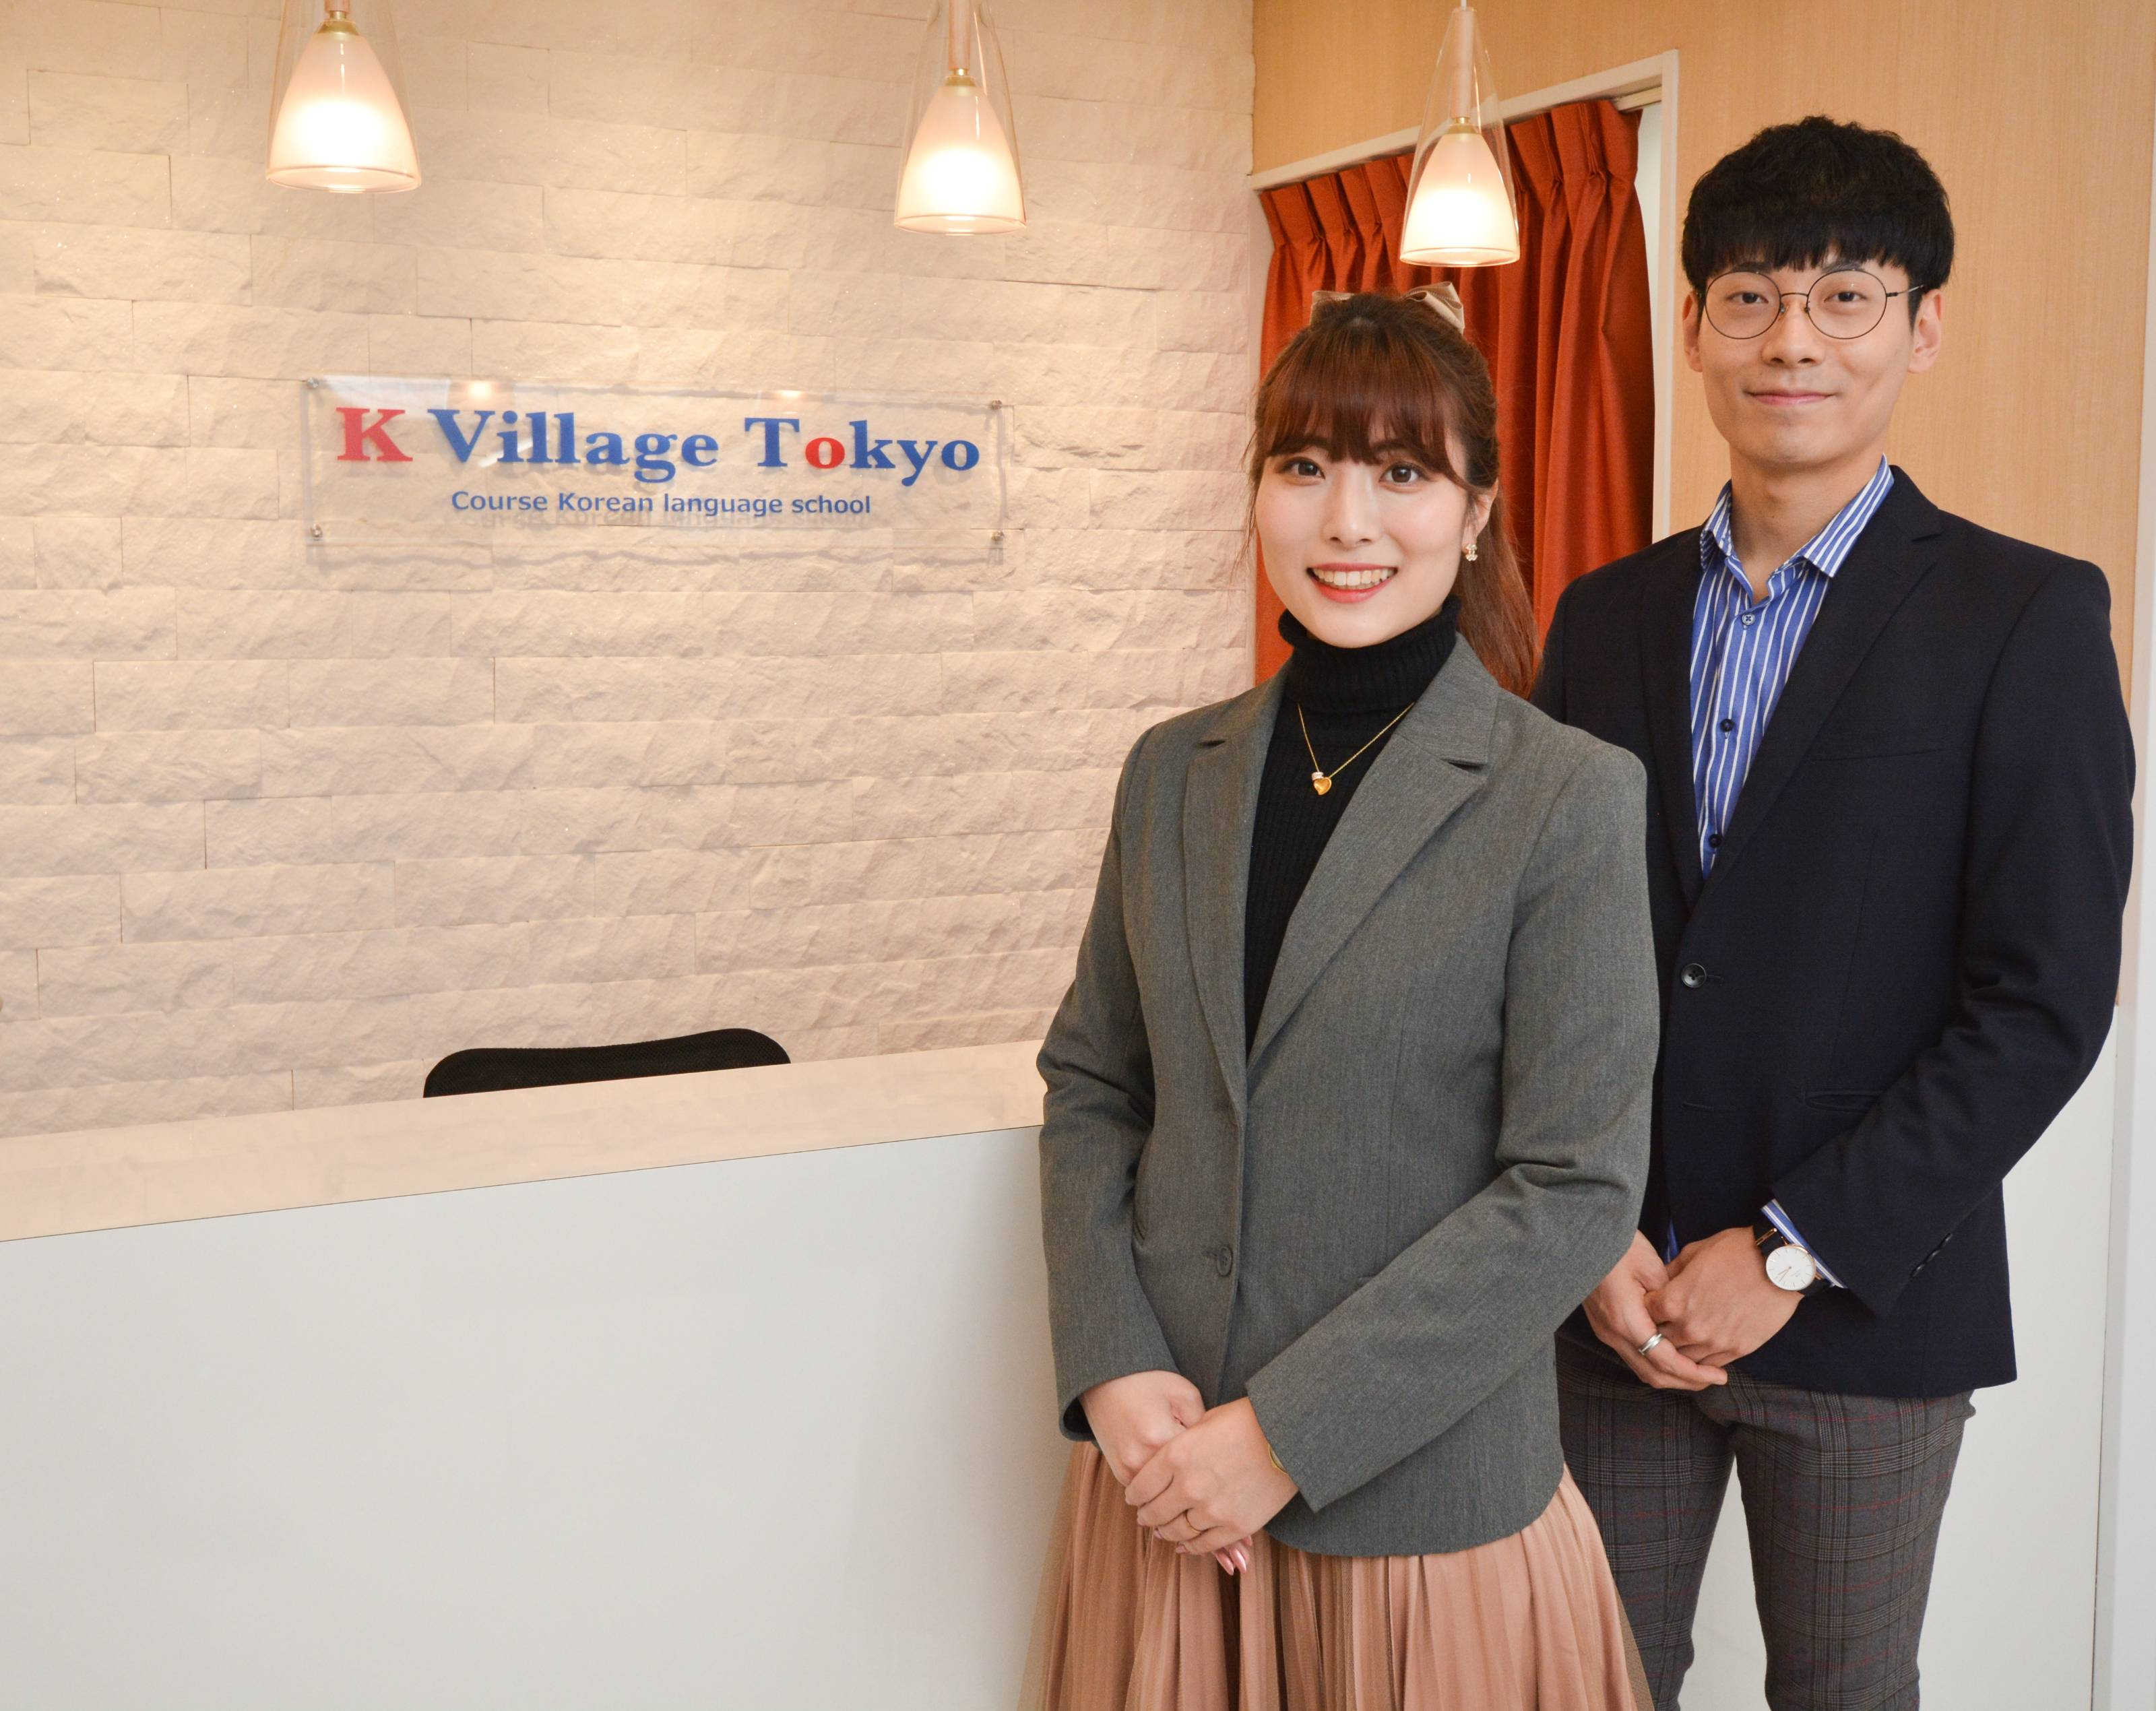 株式会社K Village Tokyo